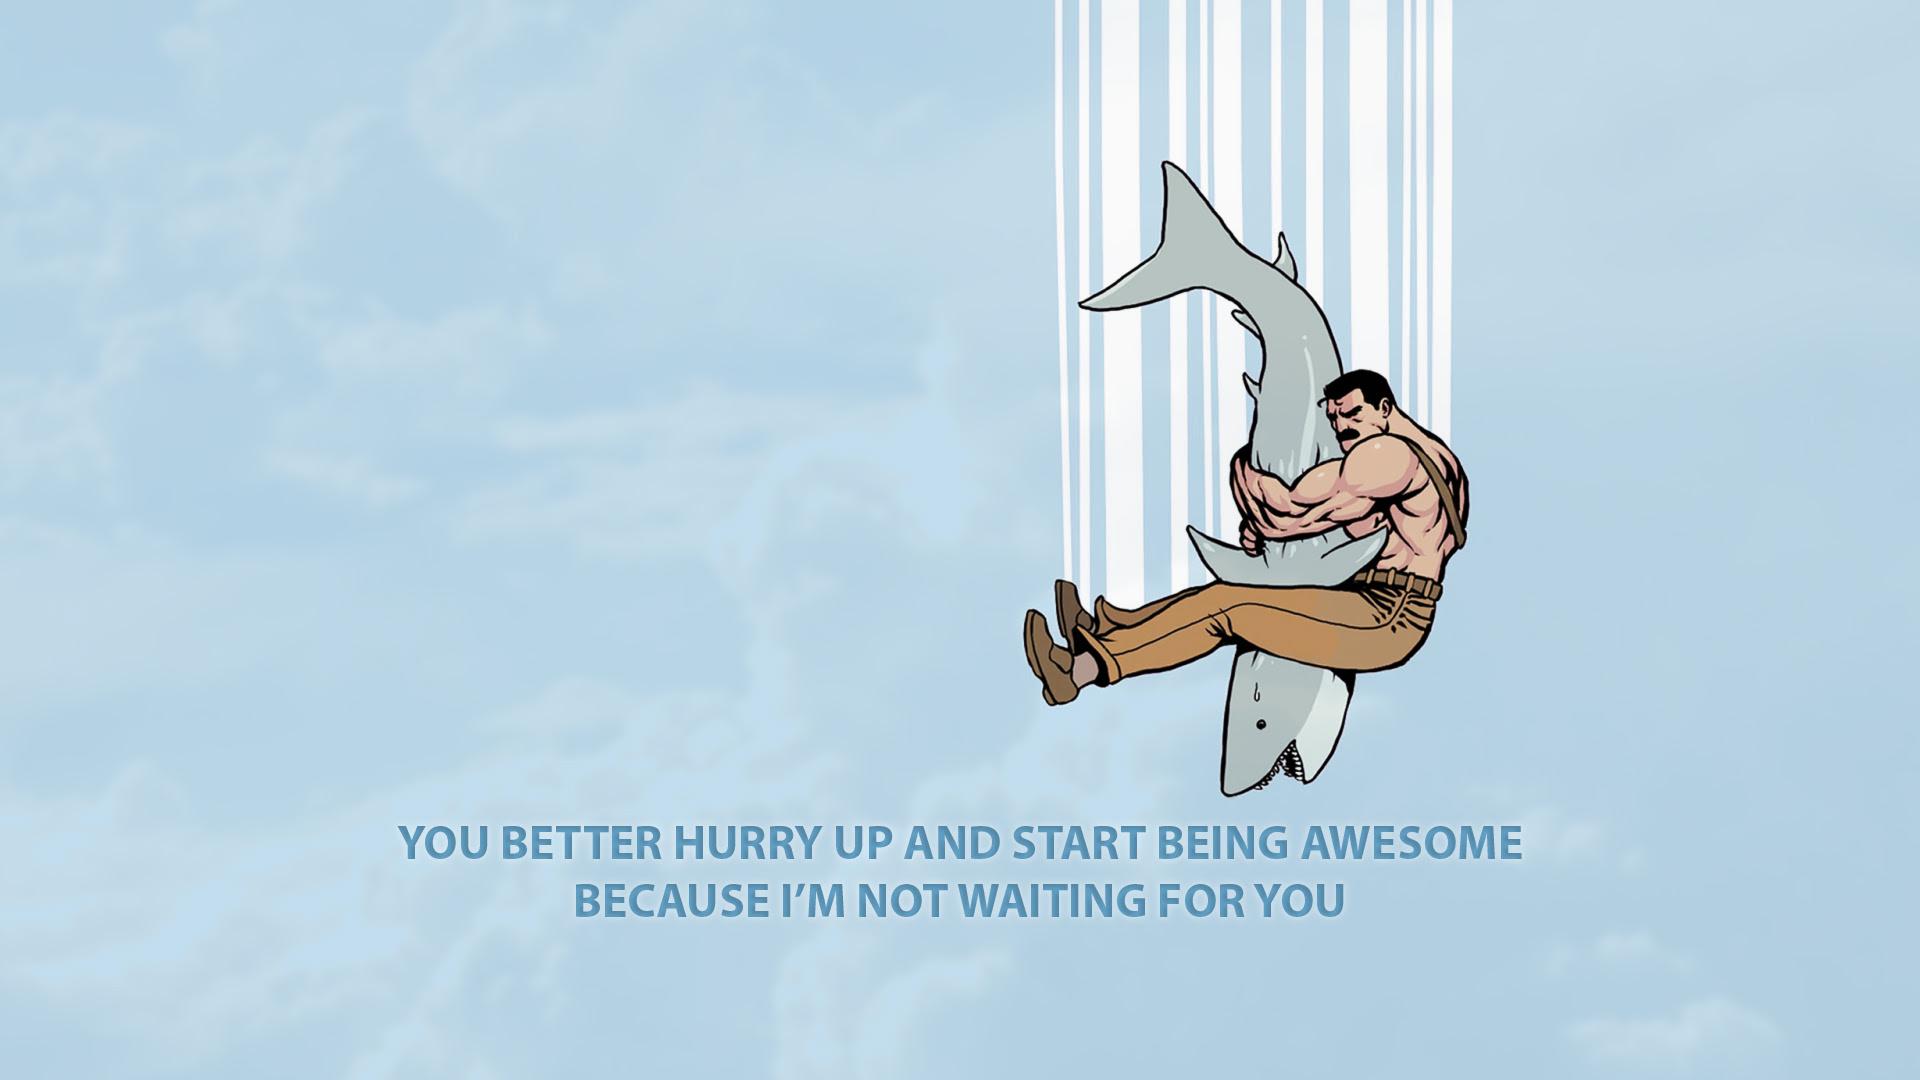 Funny Motivational Wallpapers | PixelsTalk.Net